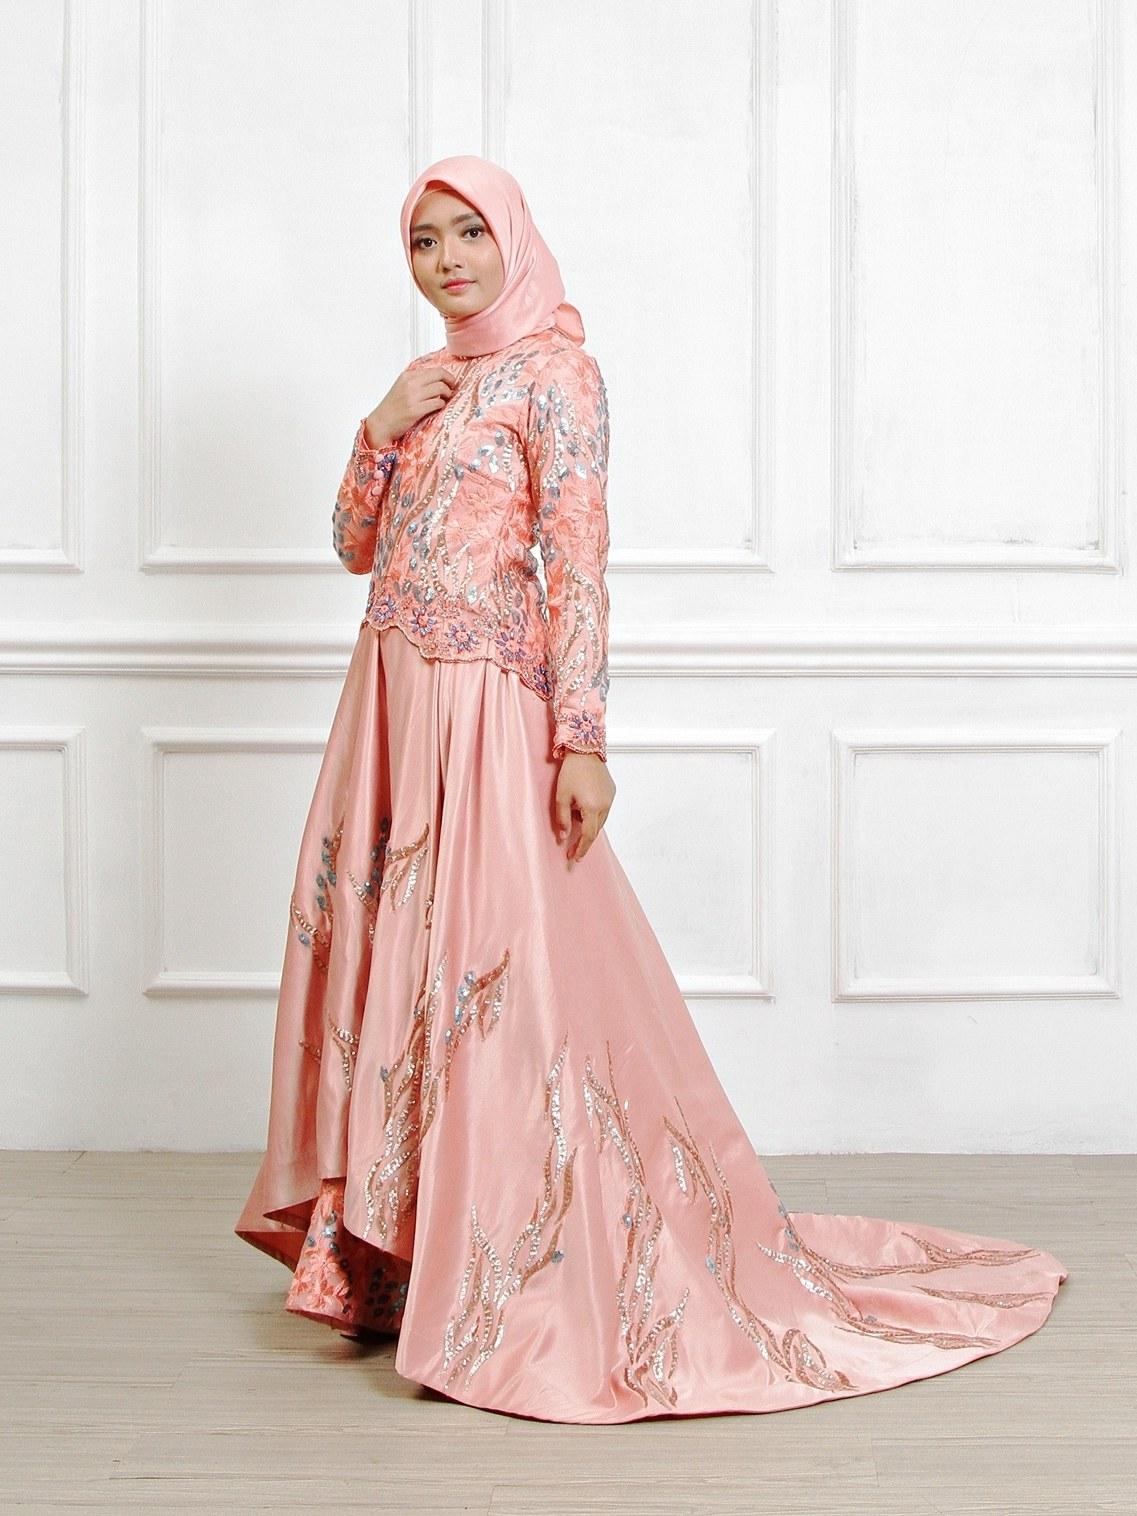 Bentuk Sewa Gaun Pengantin Muslimah Di Bekasi 8ydm Gaun Pengantin Muslimah Dress Muslim Pungky Rumah Jahit